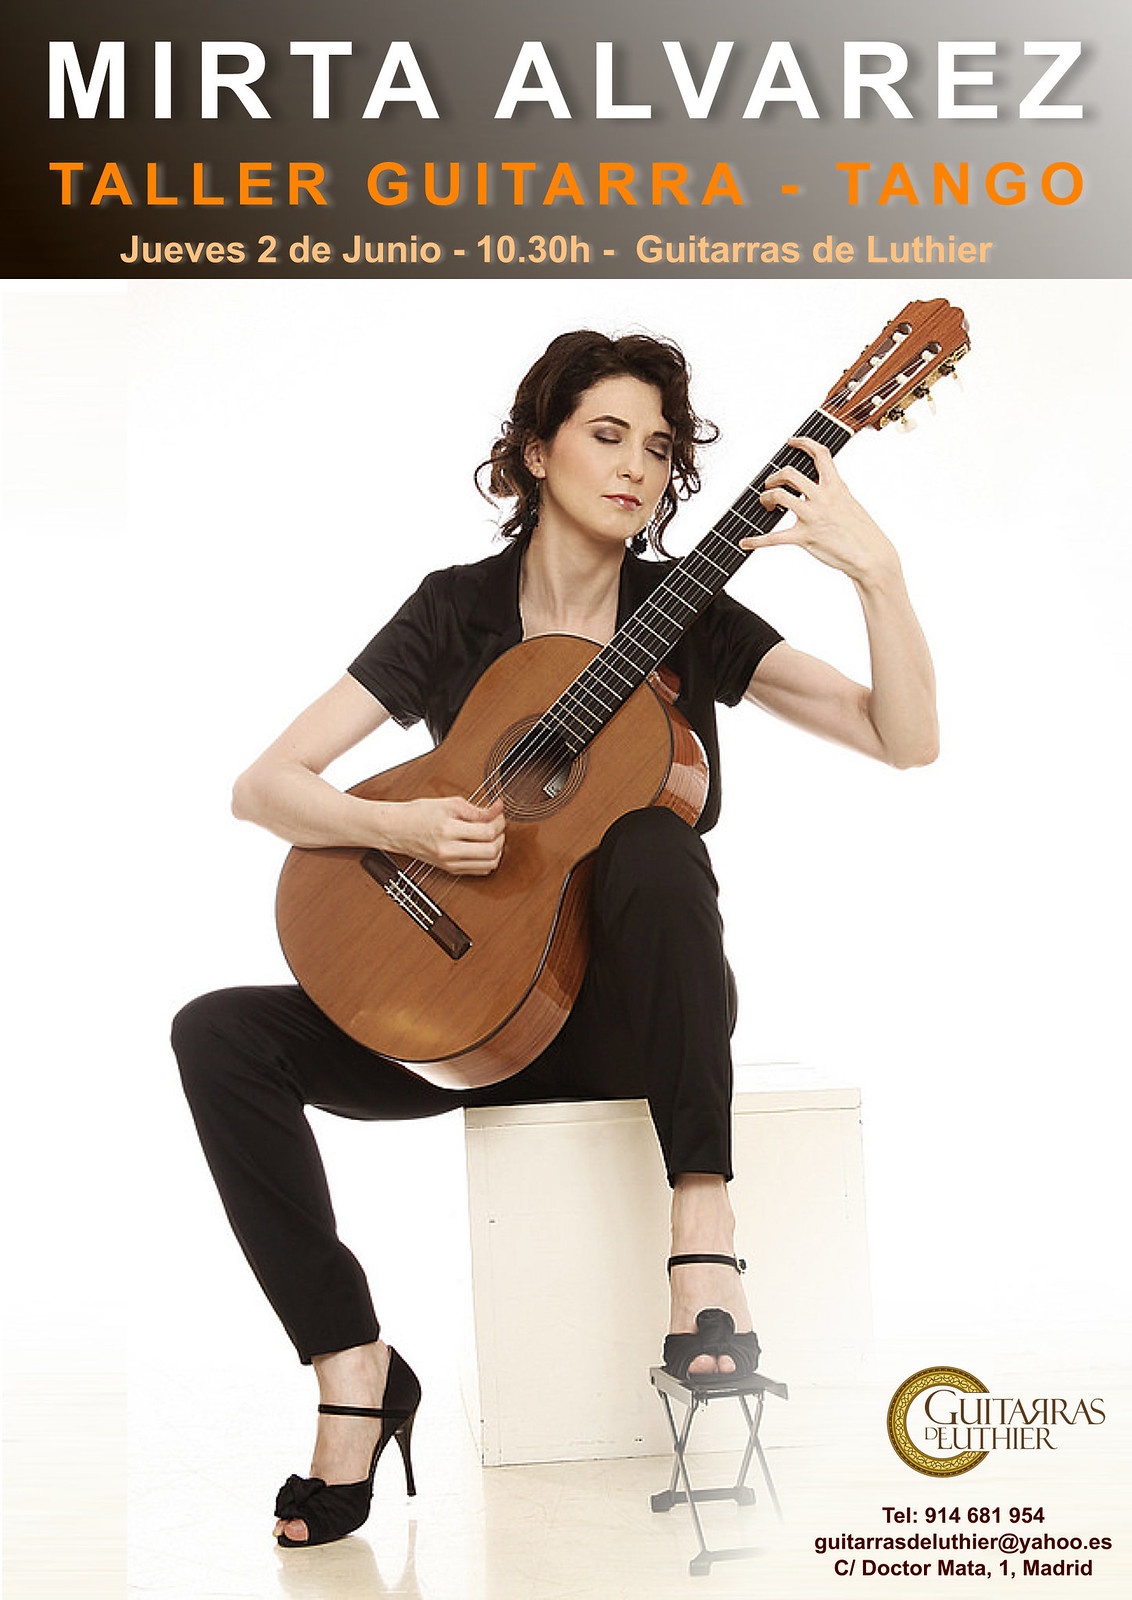 http://www.guitarrasdeluthier.com/es/agenda/taller-guitarra-tango/28